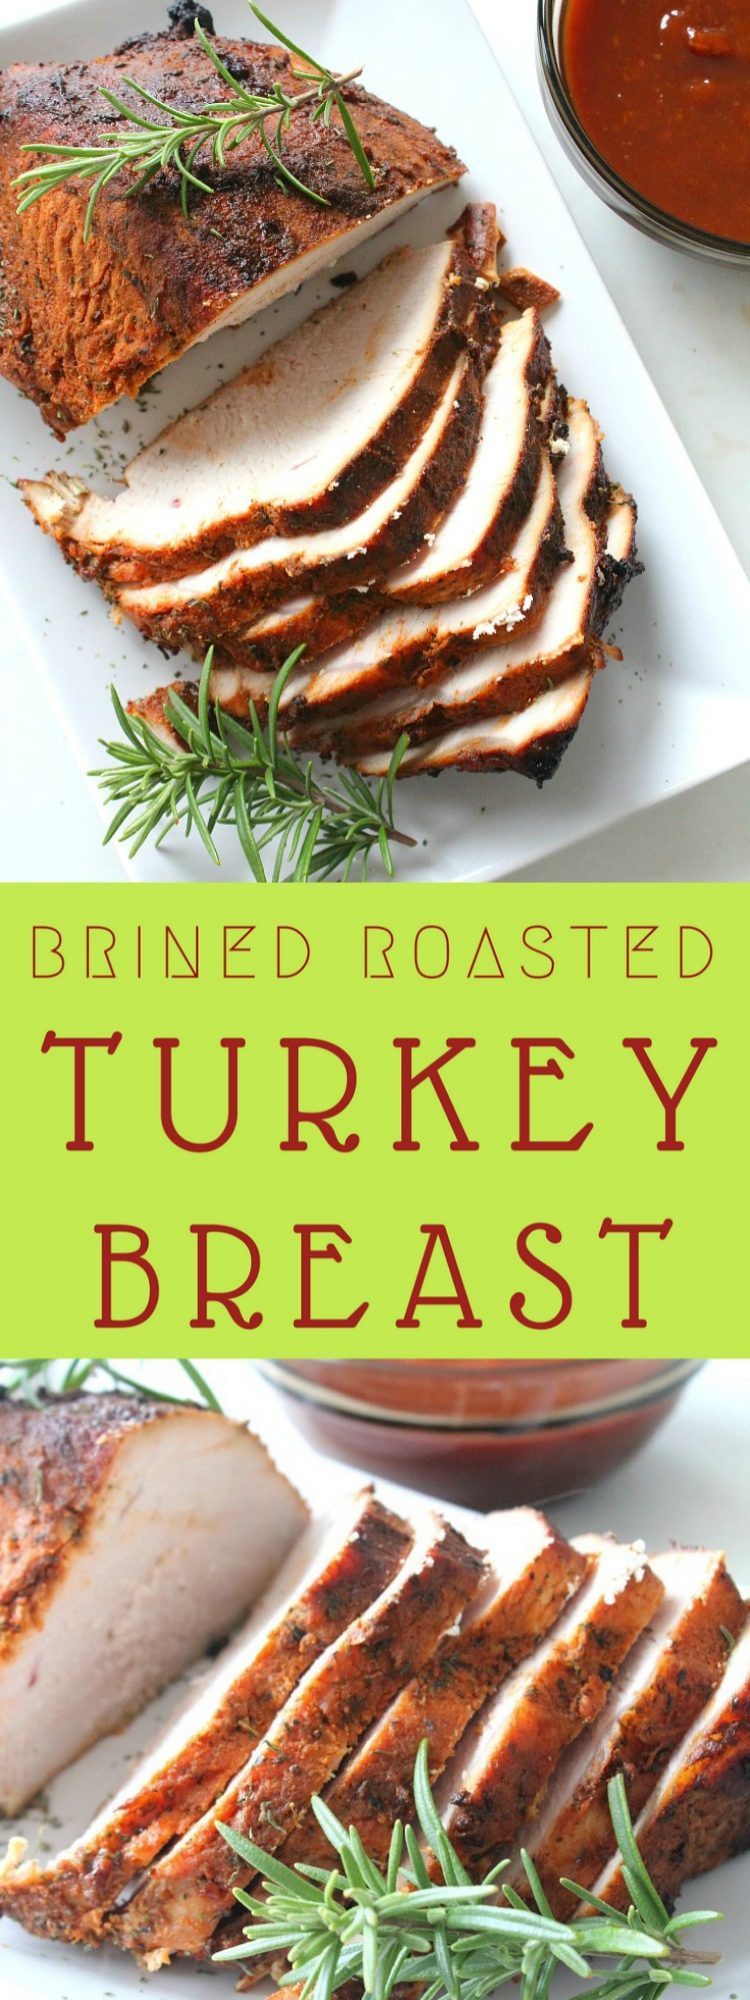 Brine For Turkey Breast  Brined Roasted Turkey Breast Recipe